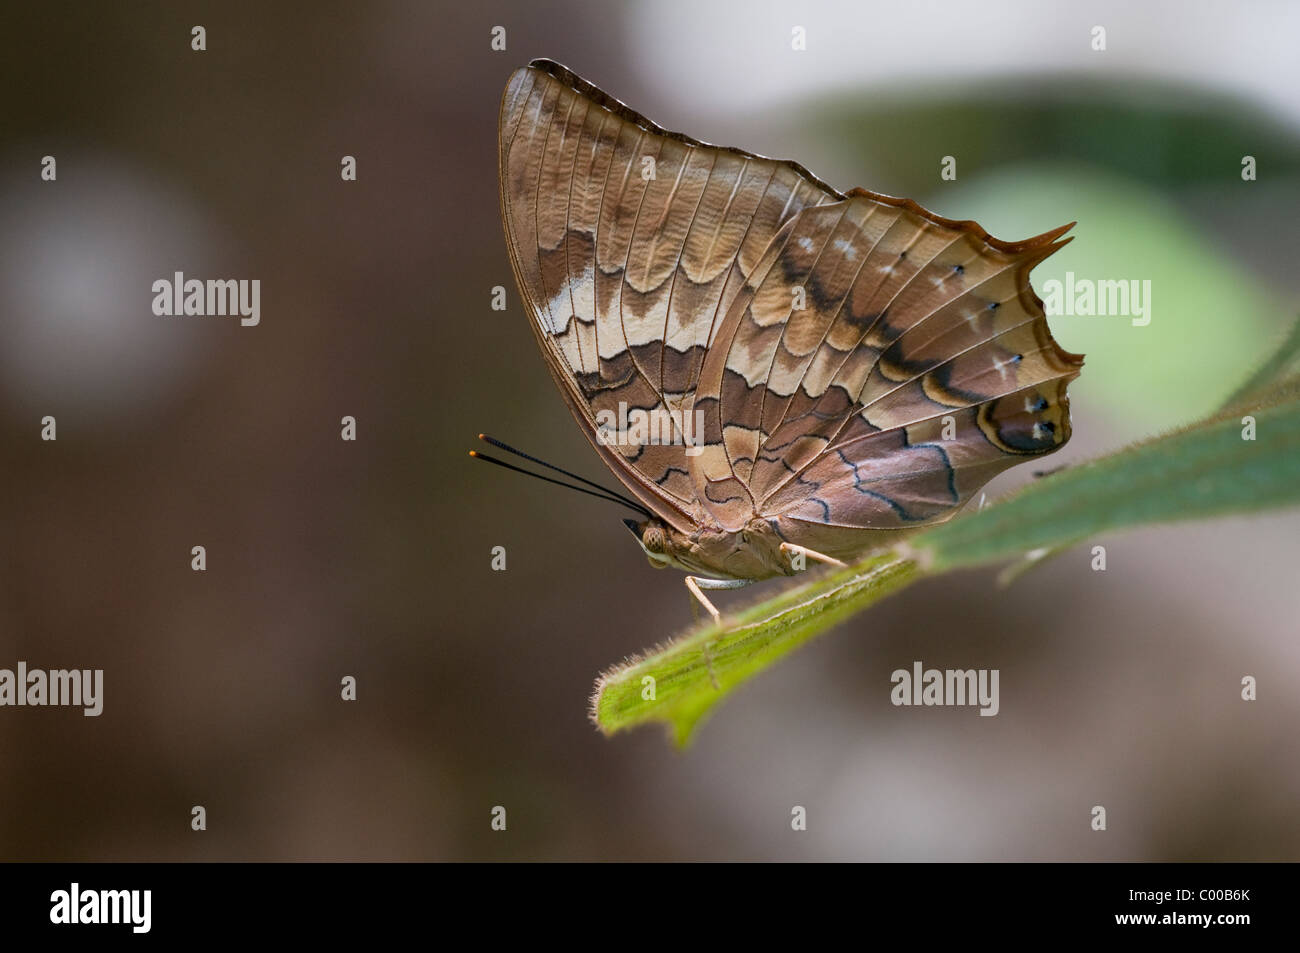 Tropischer Schmetterling, farfalle tropicali, Tanjung messa Nationalpark, Indonesien, Indonesia Immagini Stock